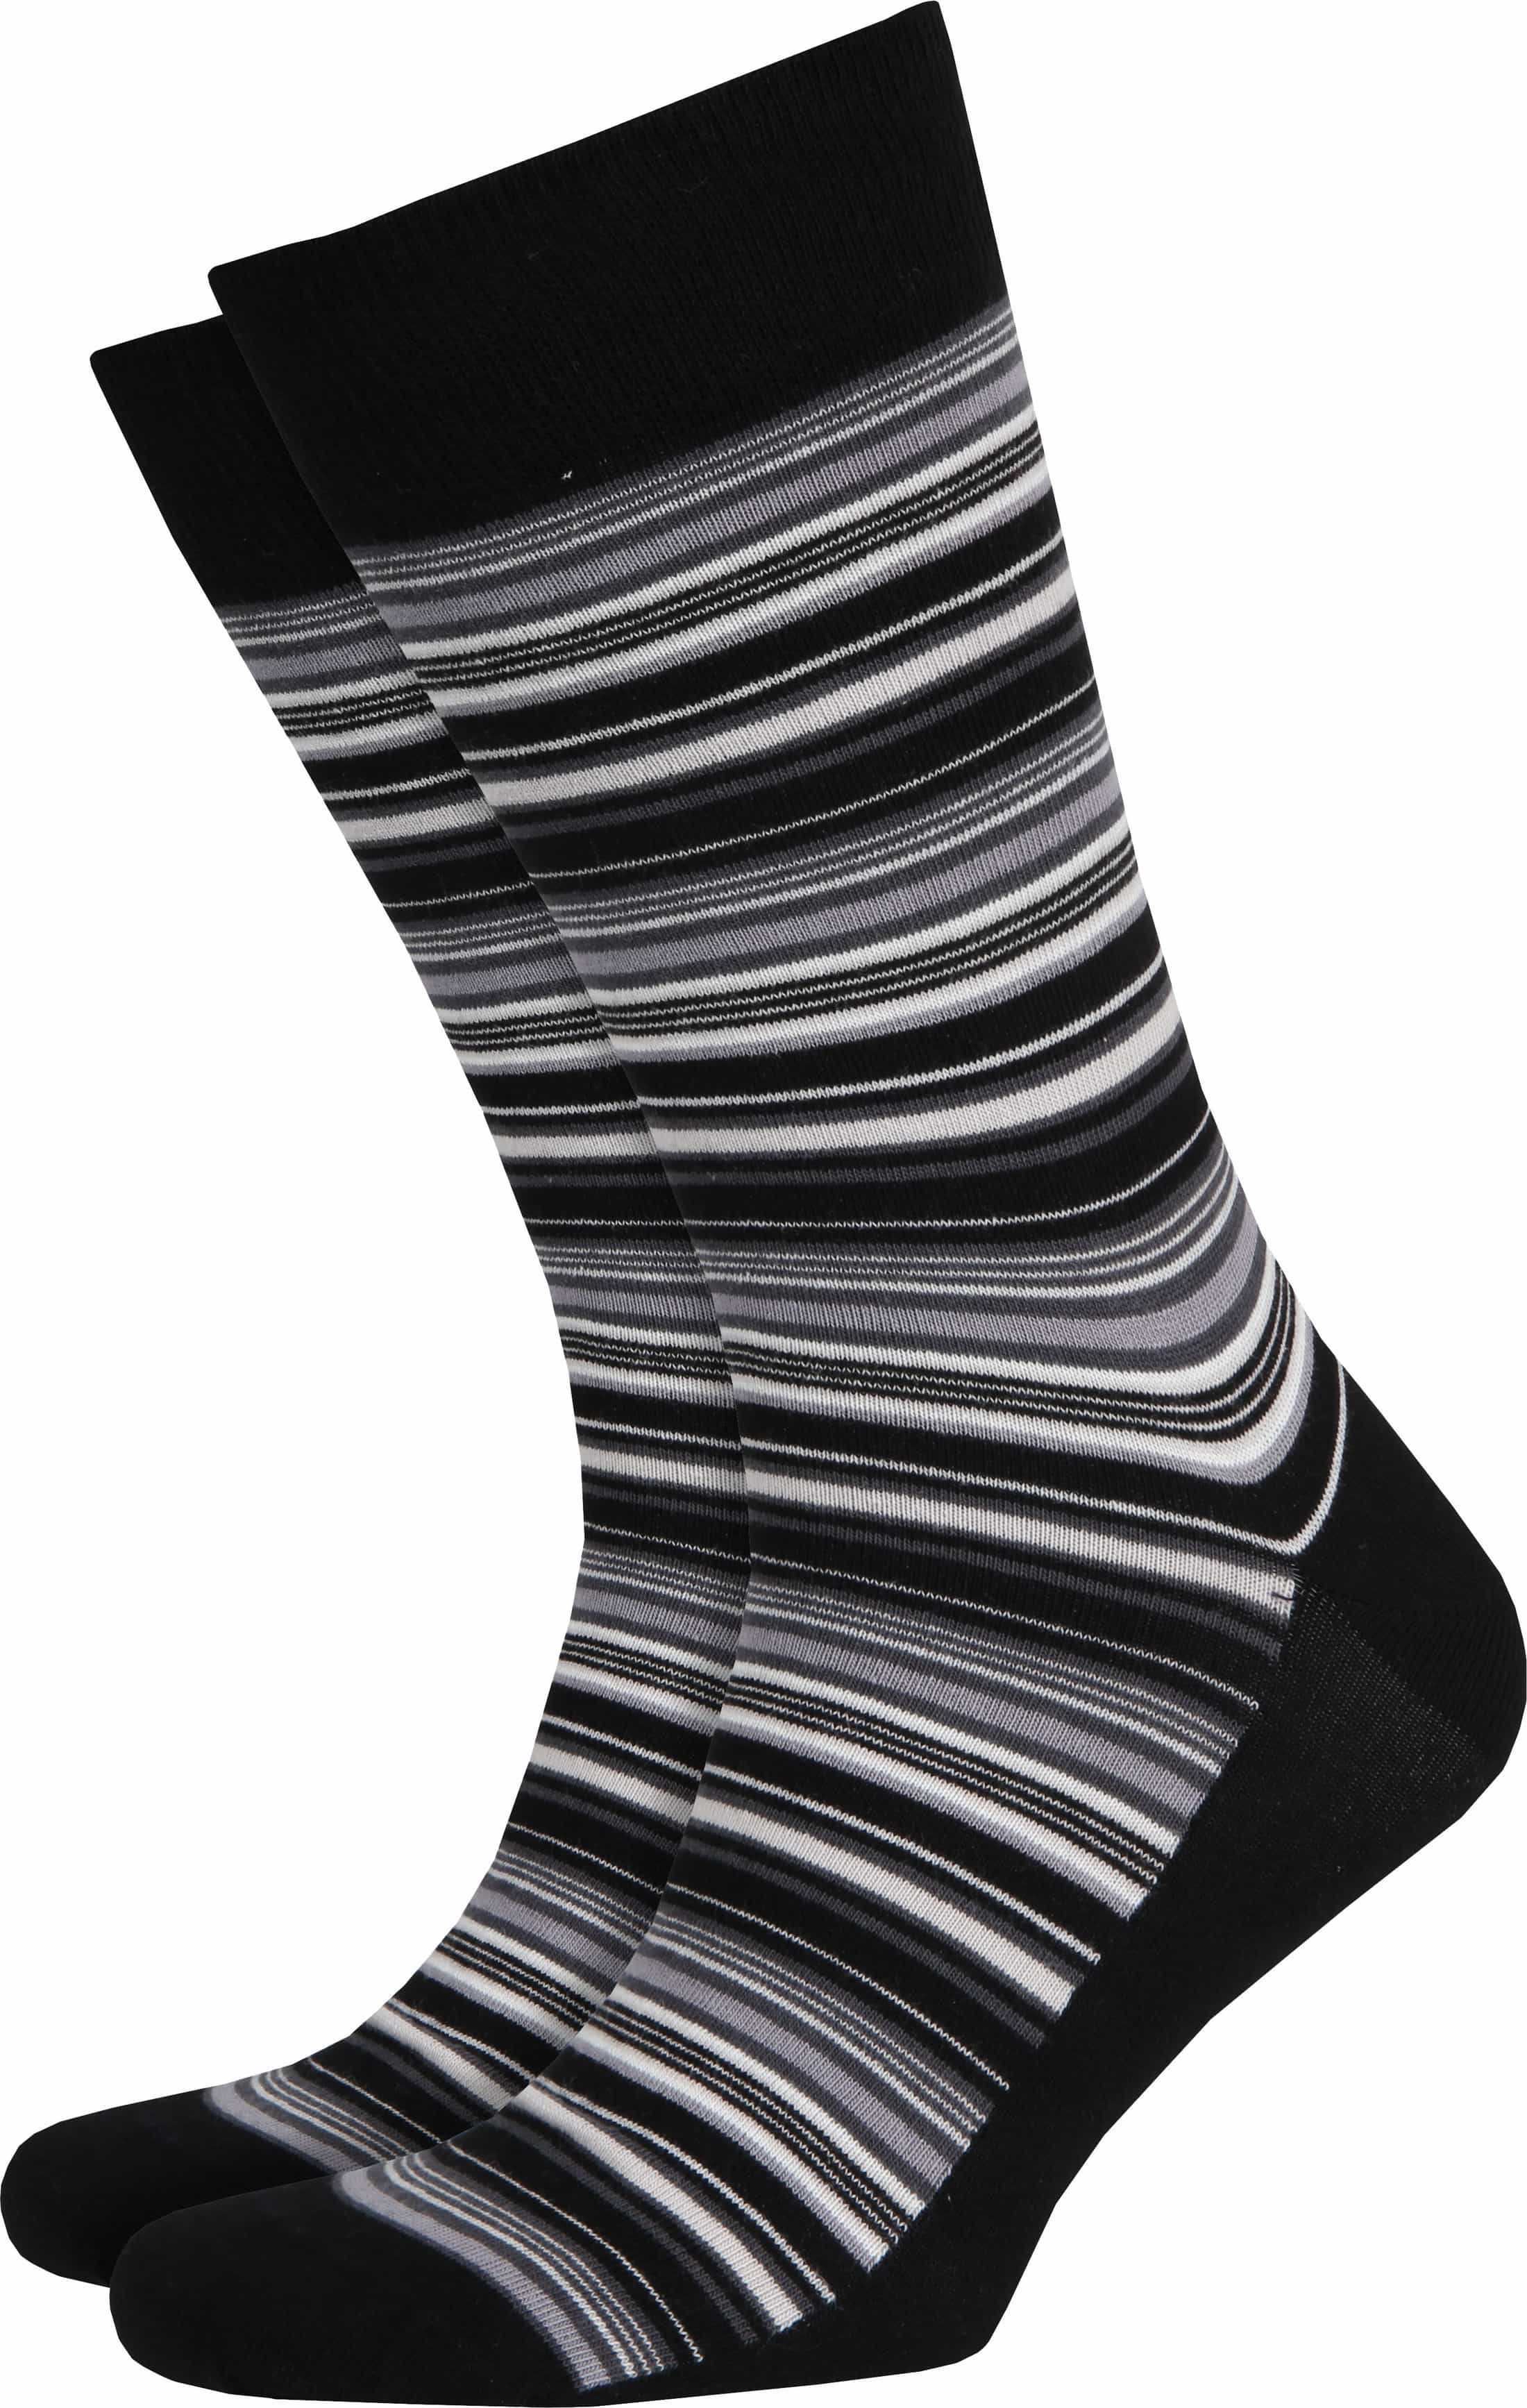 Suitable Socken Grau Streifen foto 0